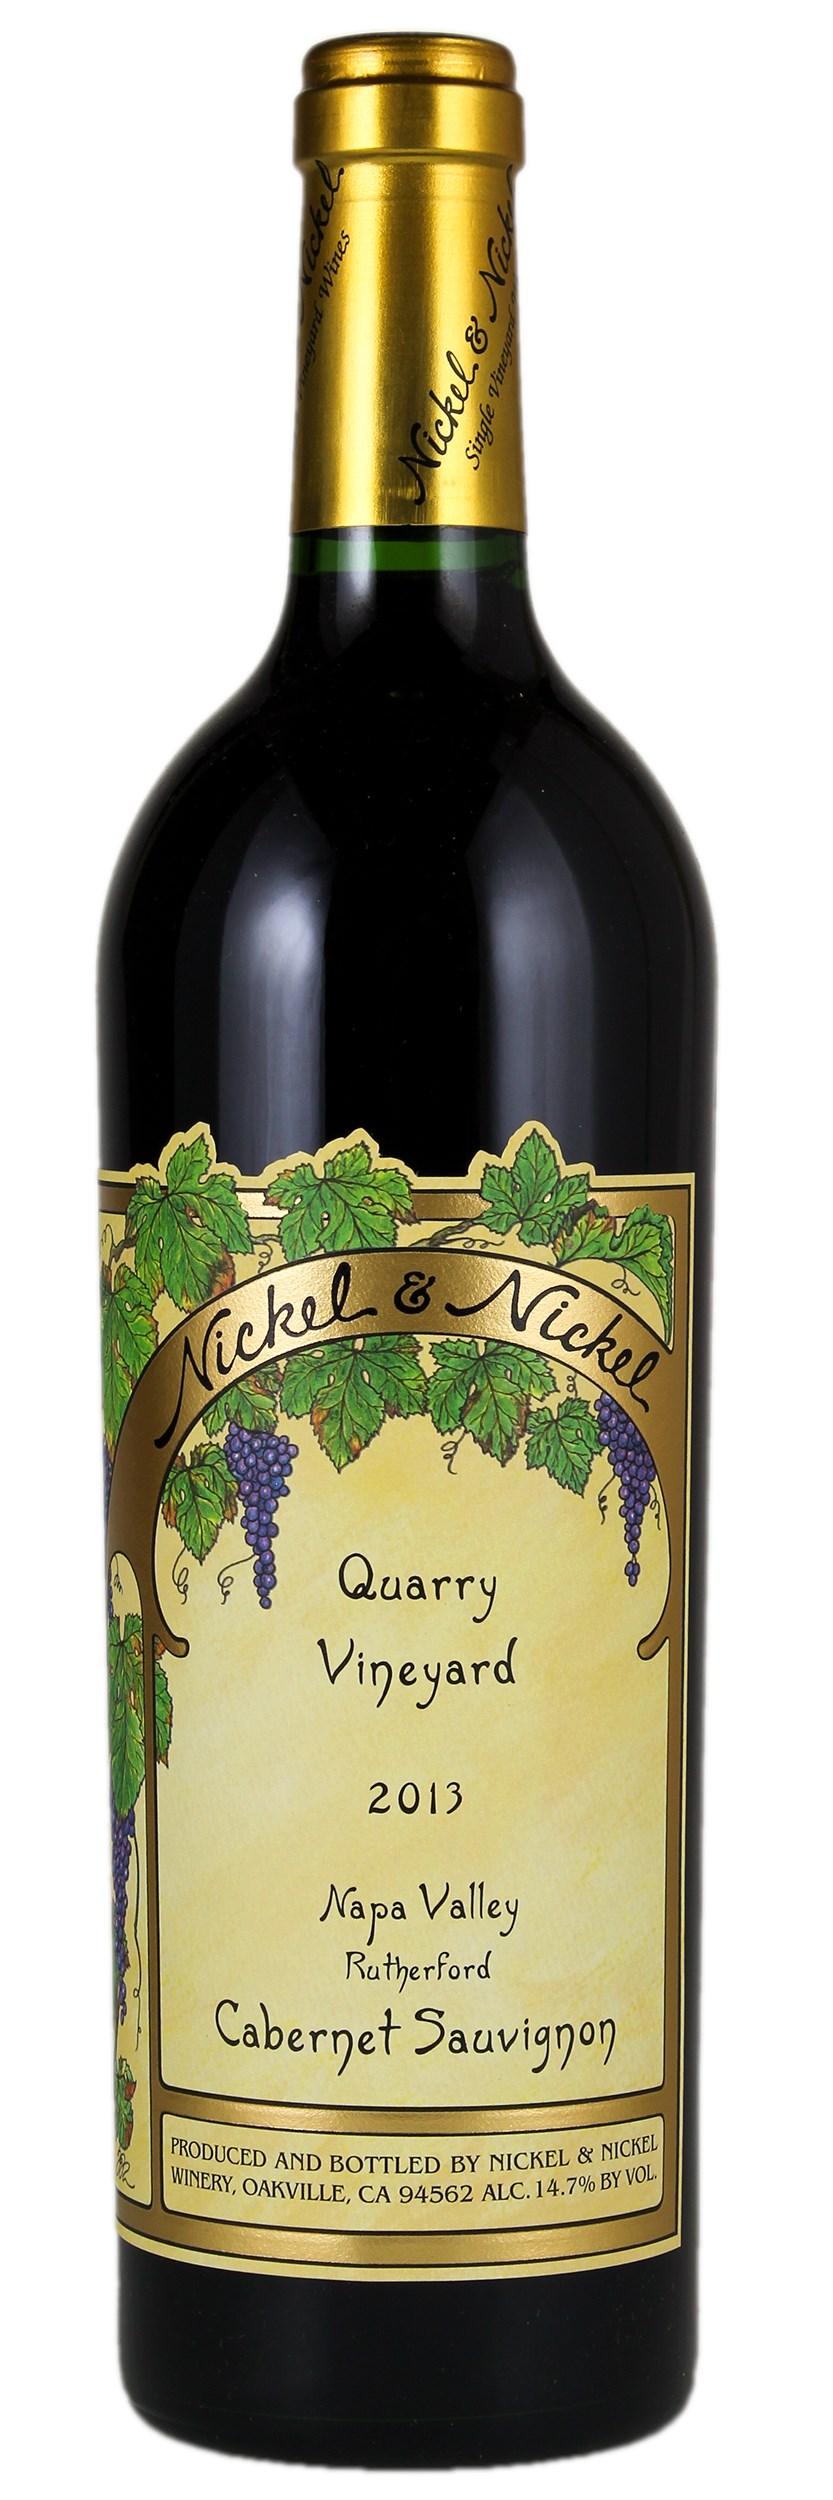 2013 Nickel and Nickel Red Wine, Cabernet Sauvignon | WineBid